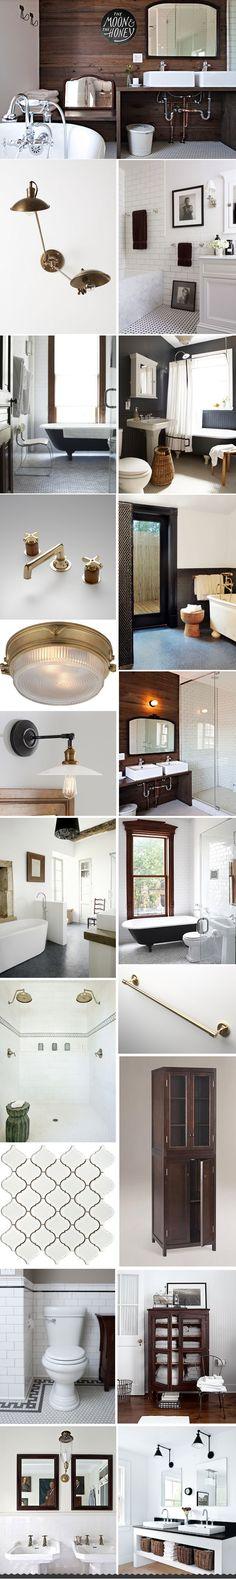 The Moon U0026 The Honey Wood U0026 White Vintage Modern Bathroom